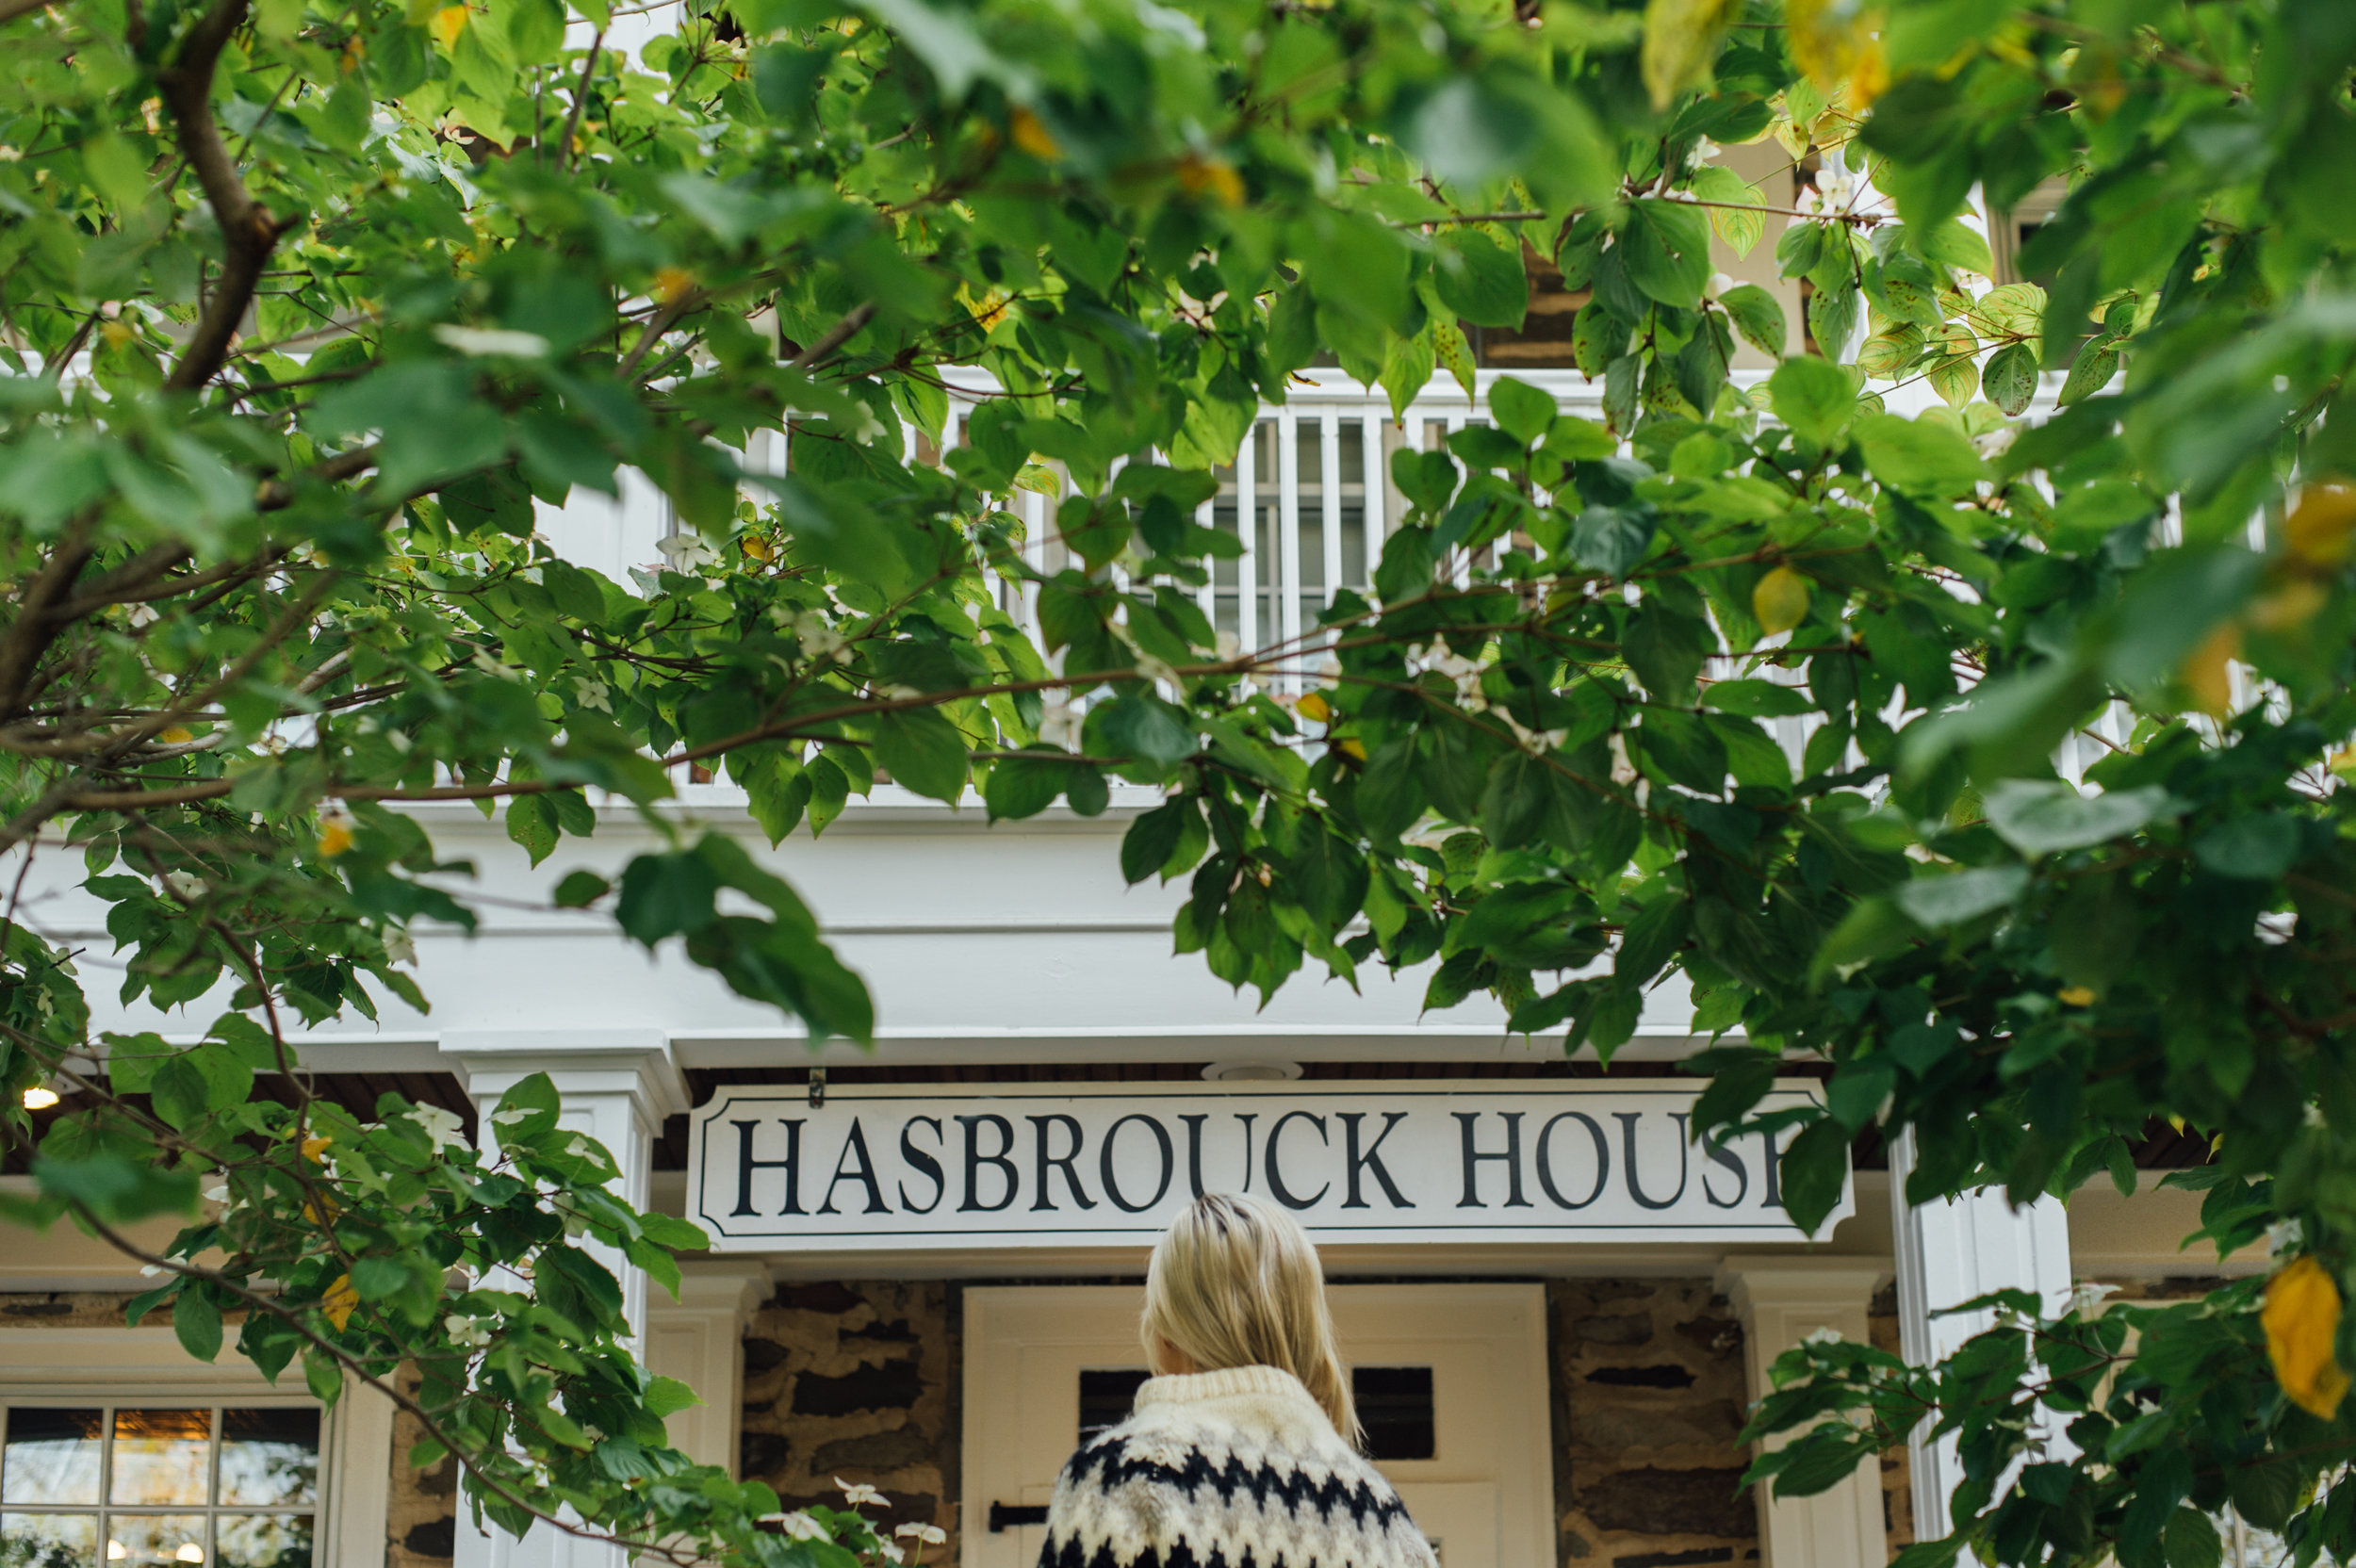 hasbrouck house new york